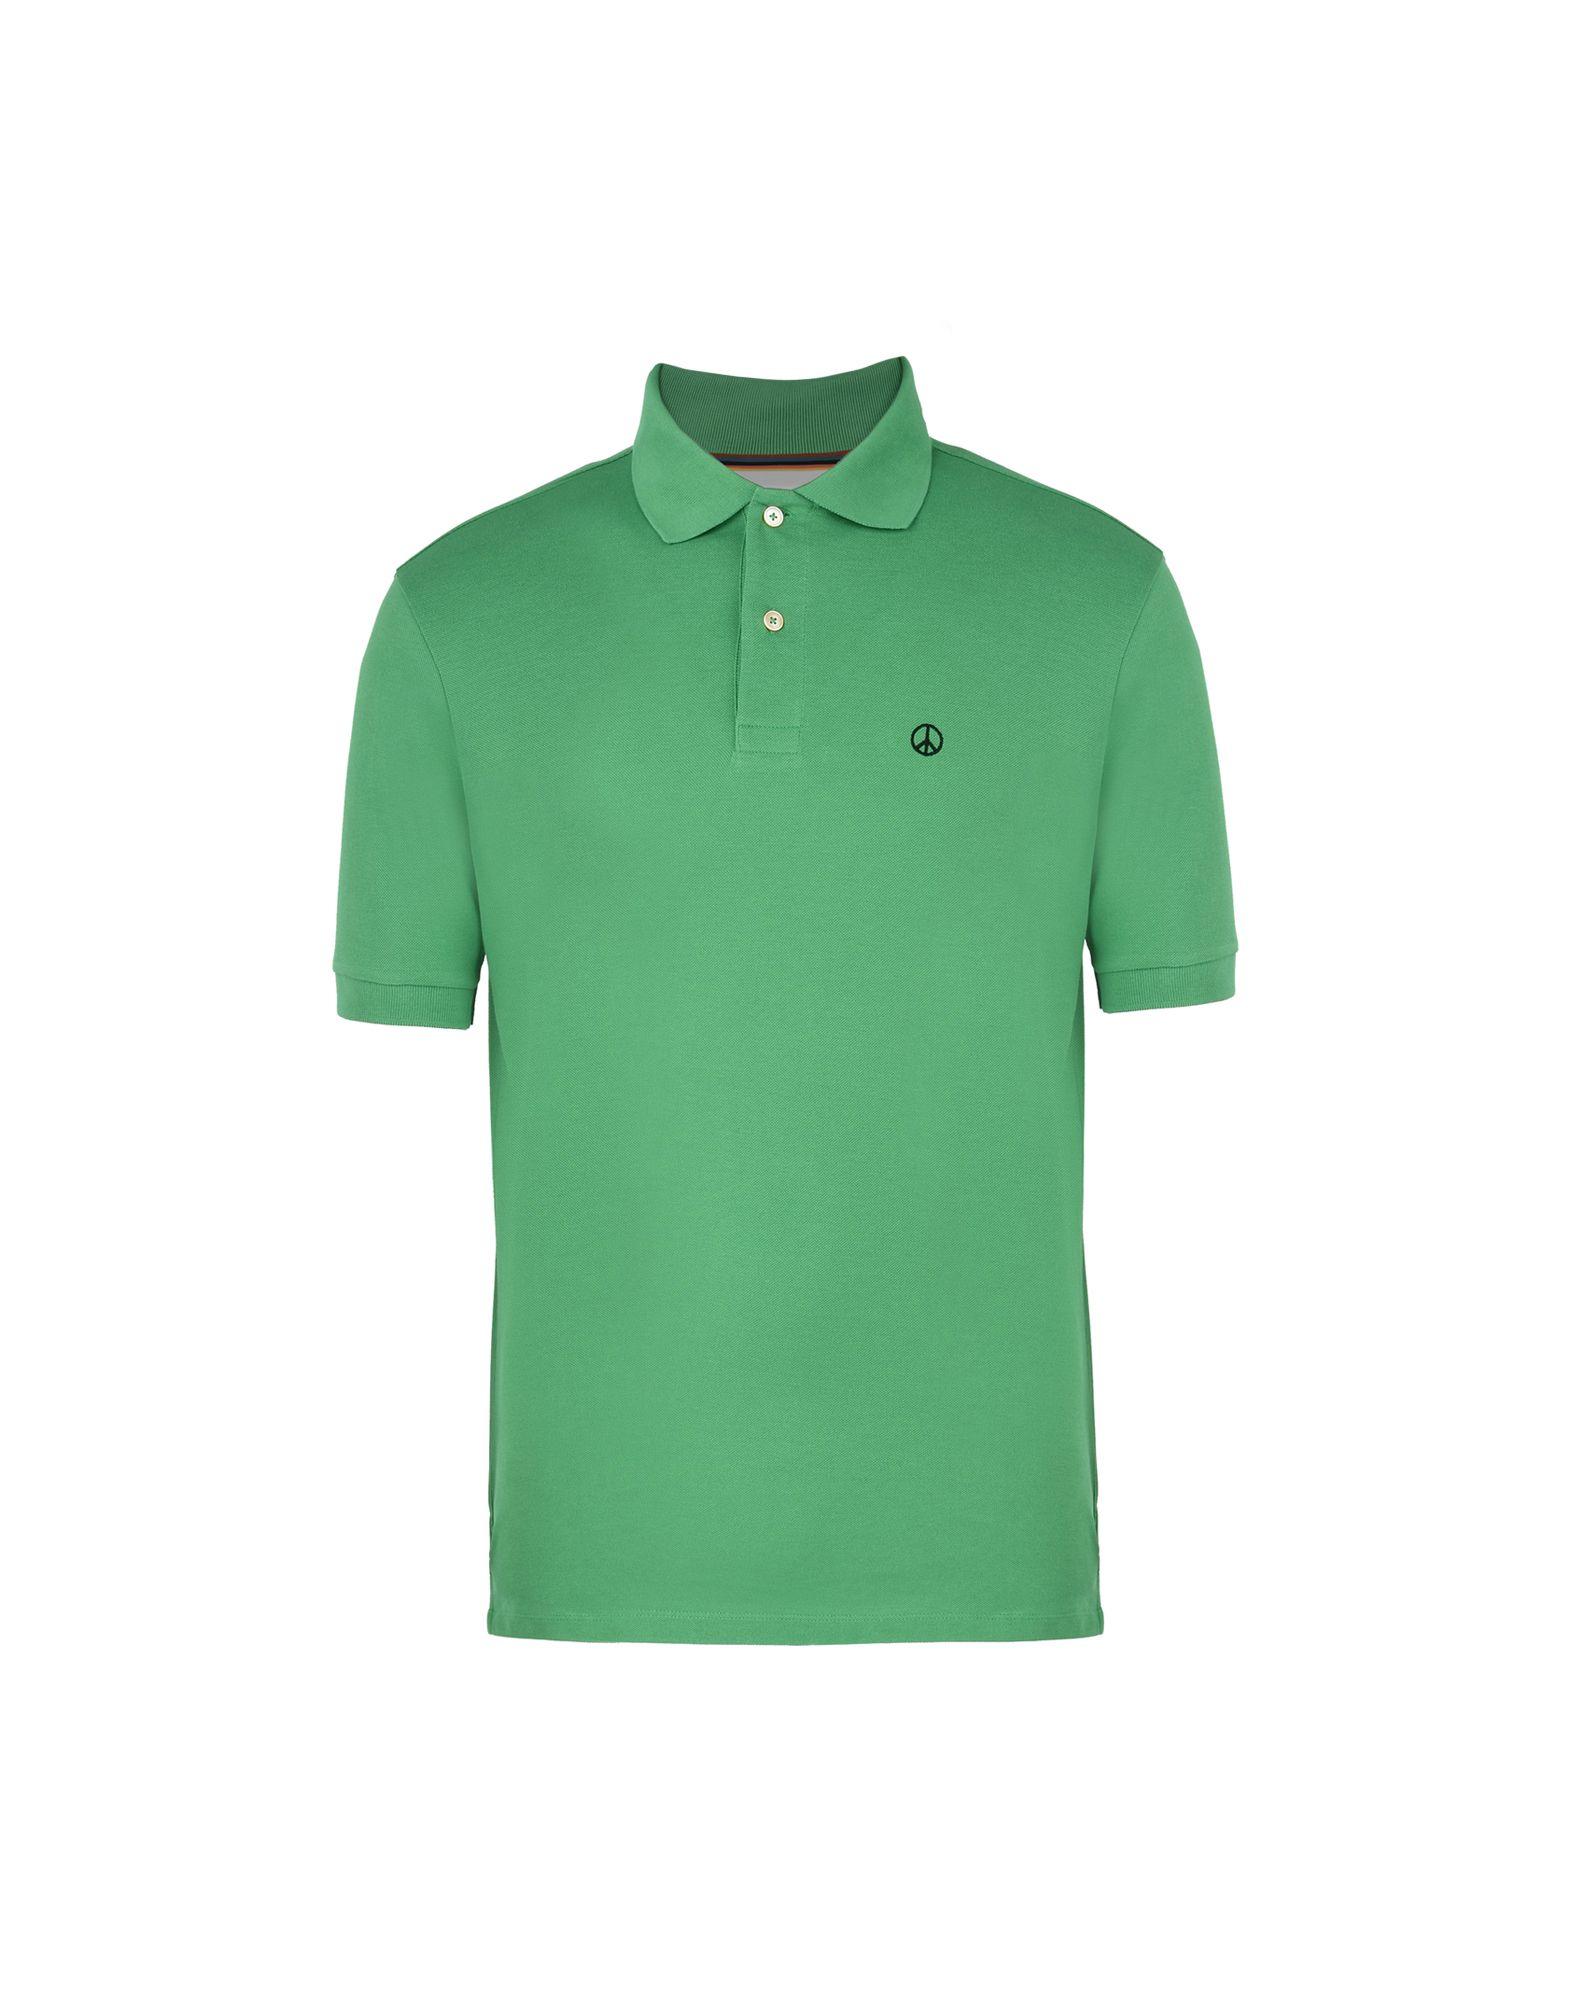 Polo Paul Smith Gents Polo Shirt - Uomo - Acquista online su